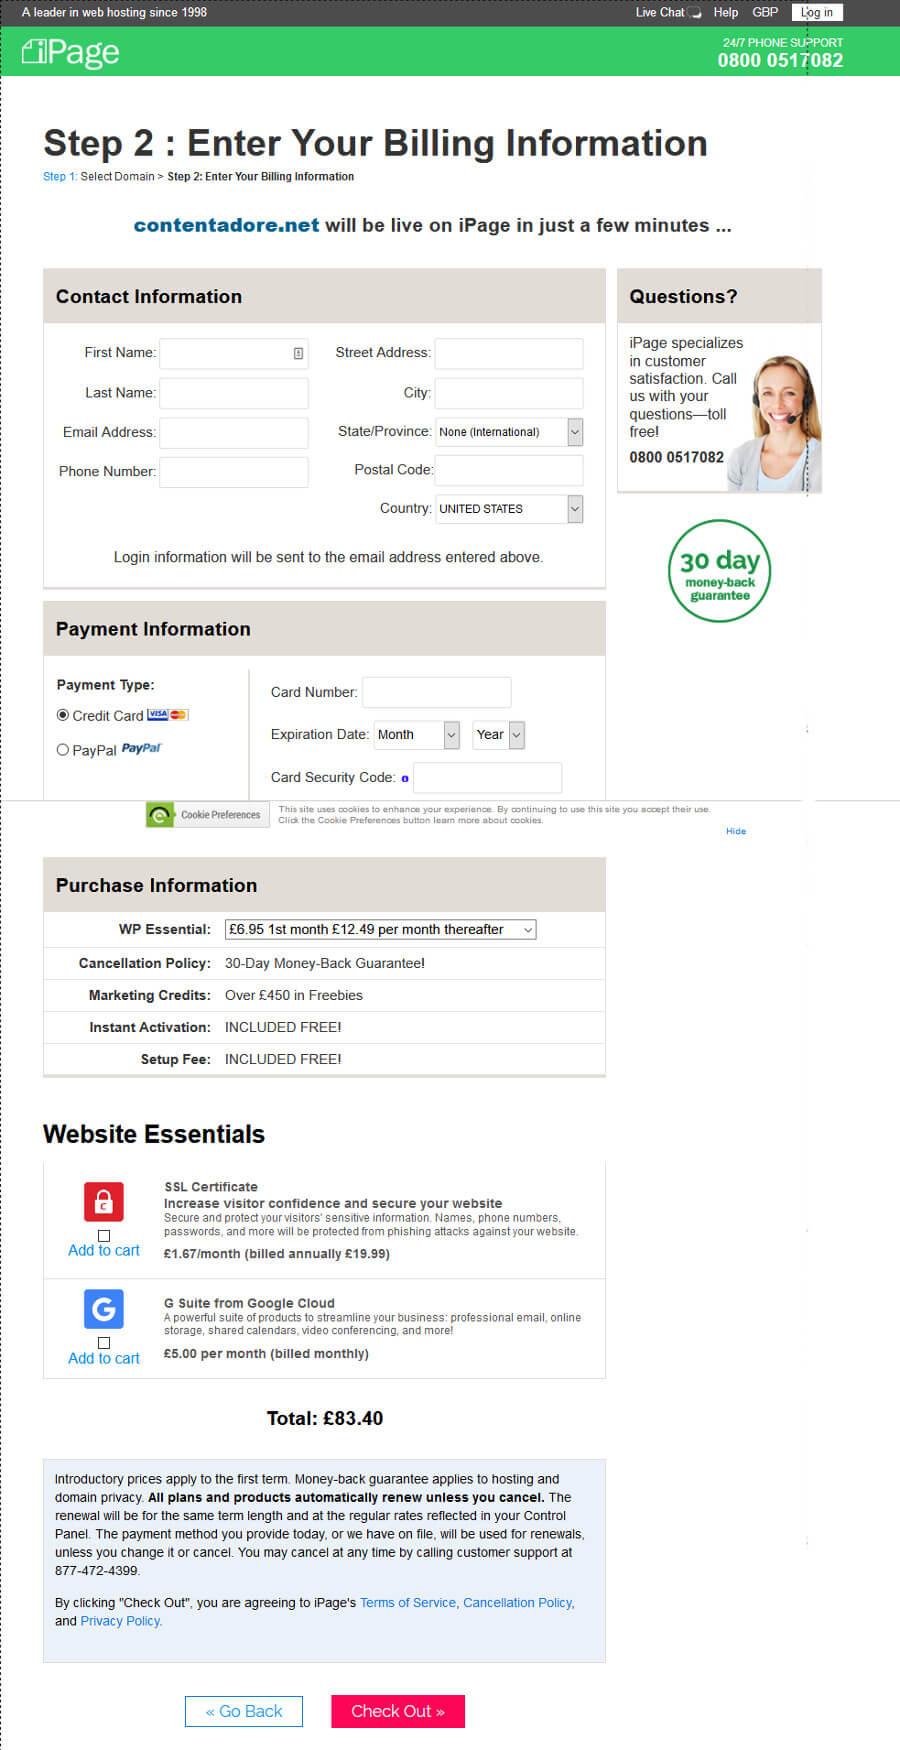 iPage registration